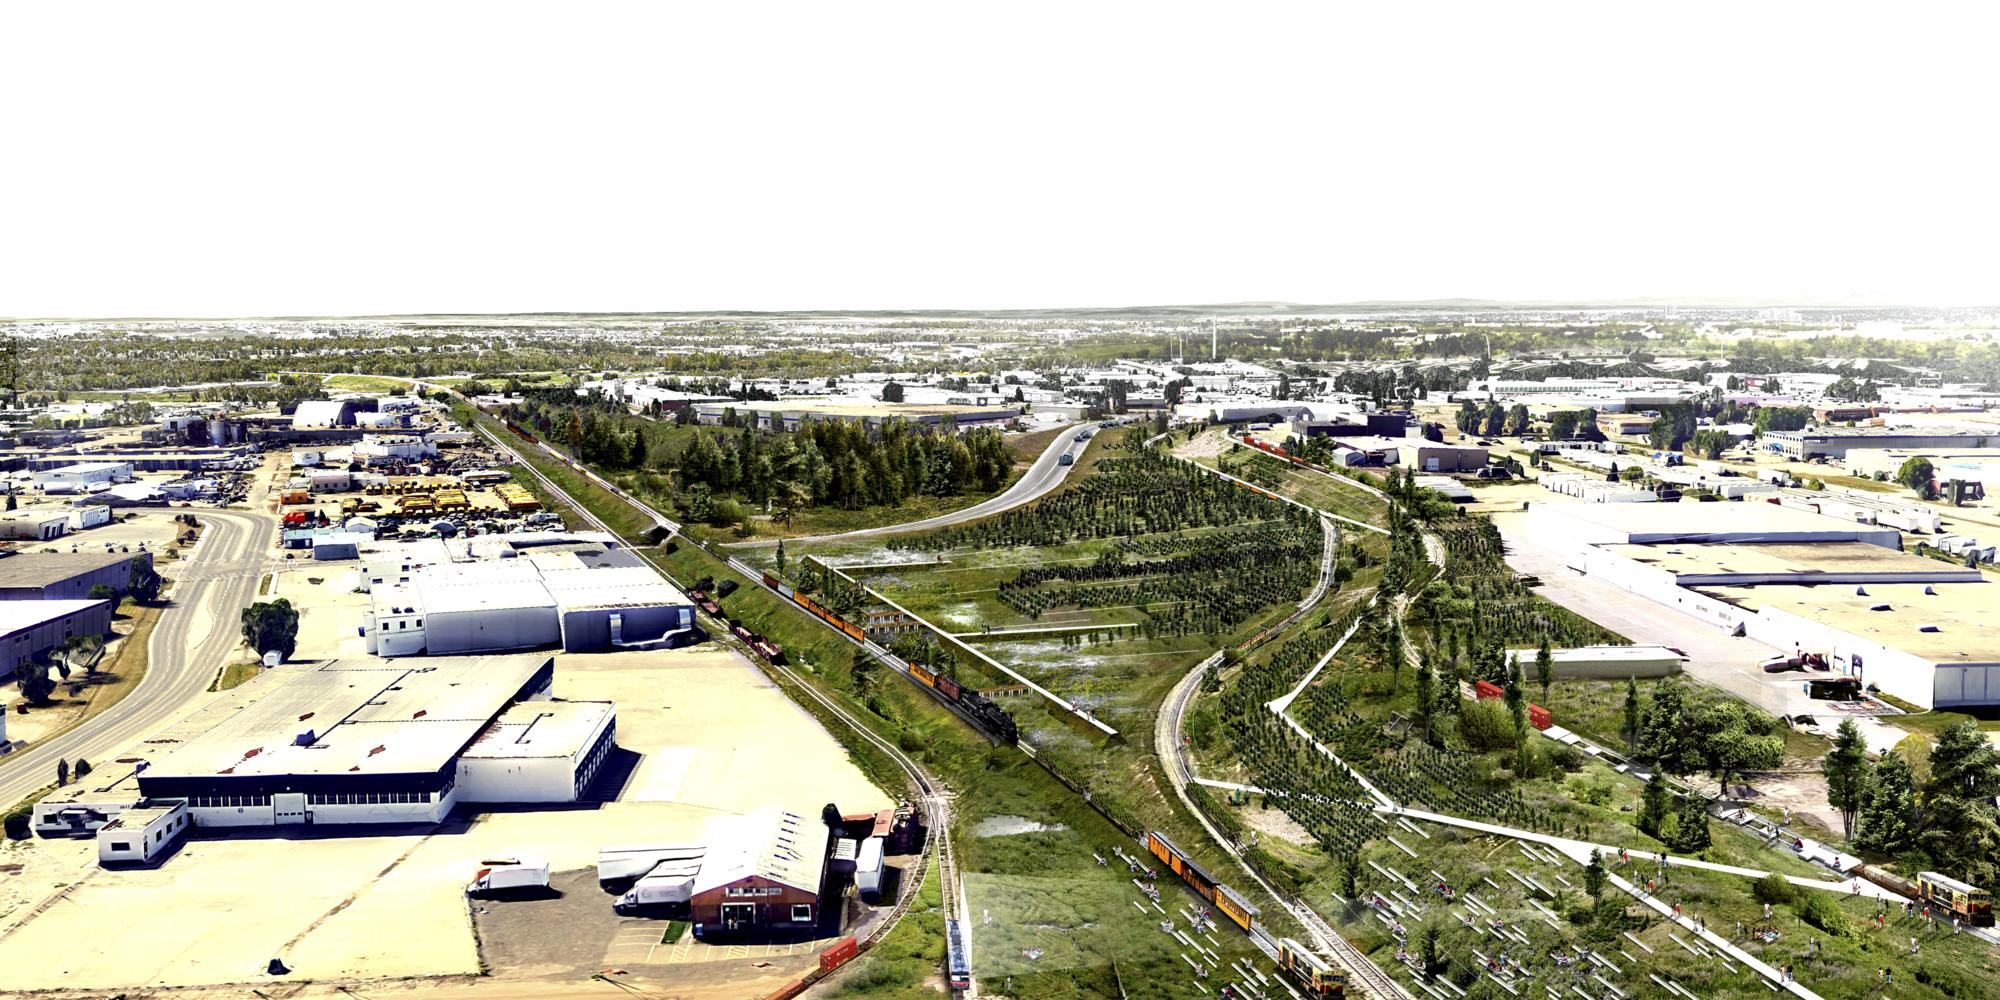 Concurso premiado plataforma arquitectura Arquitectura del paisaje